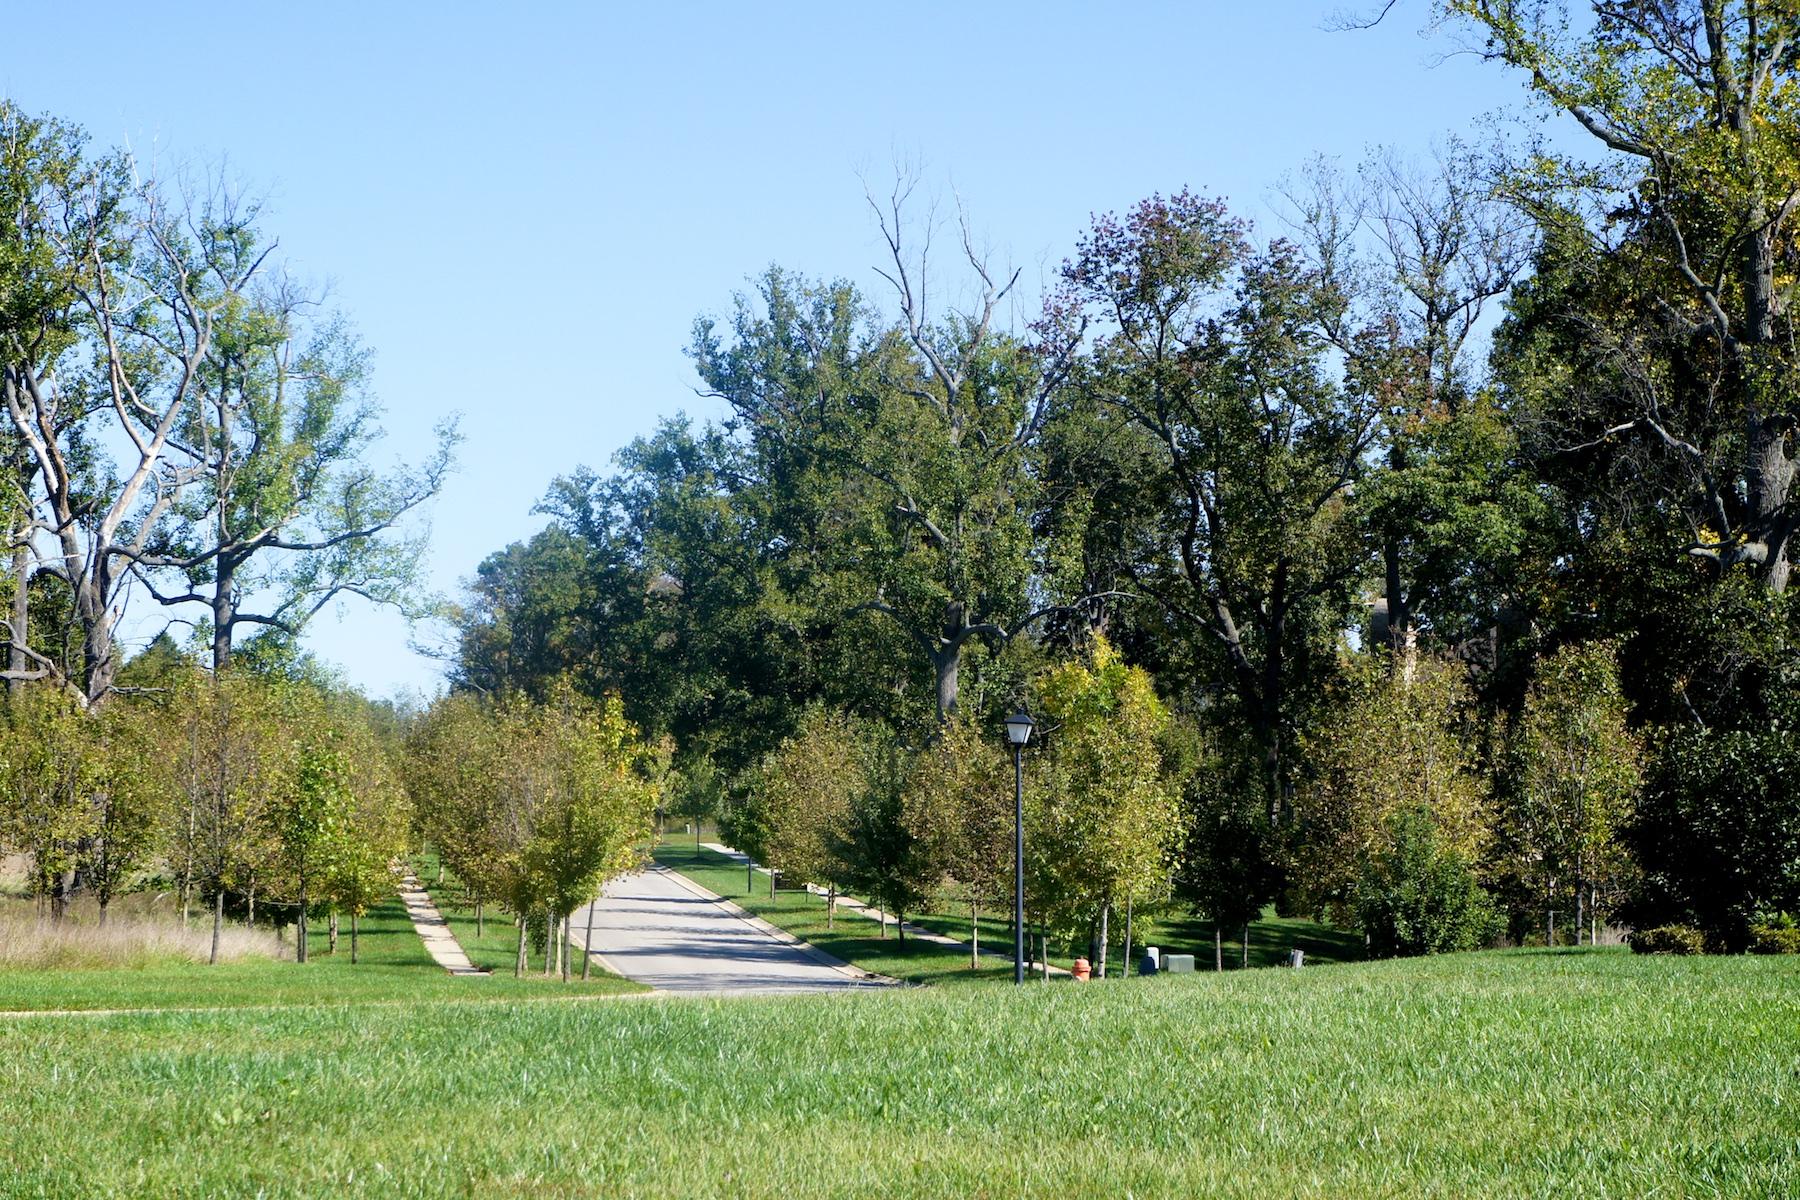 Additional photo for property listing at 103 Poplarleaf Lane 103 Poplarleaf Lane Goshen, Kentucky 40026 United States